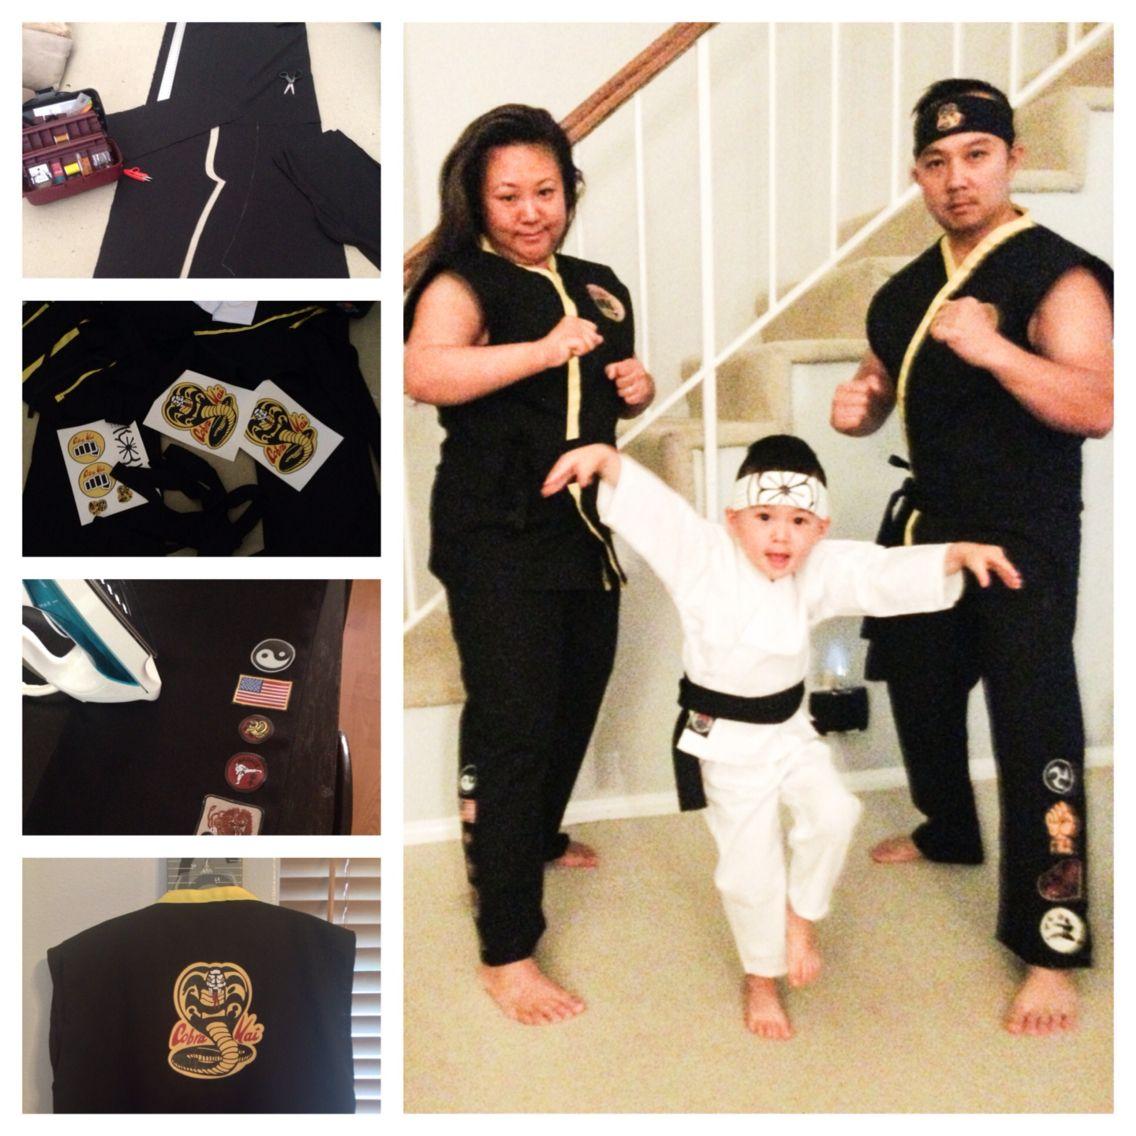 The Karate Kid, Cobra Kai Halloween Costumes Playing